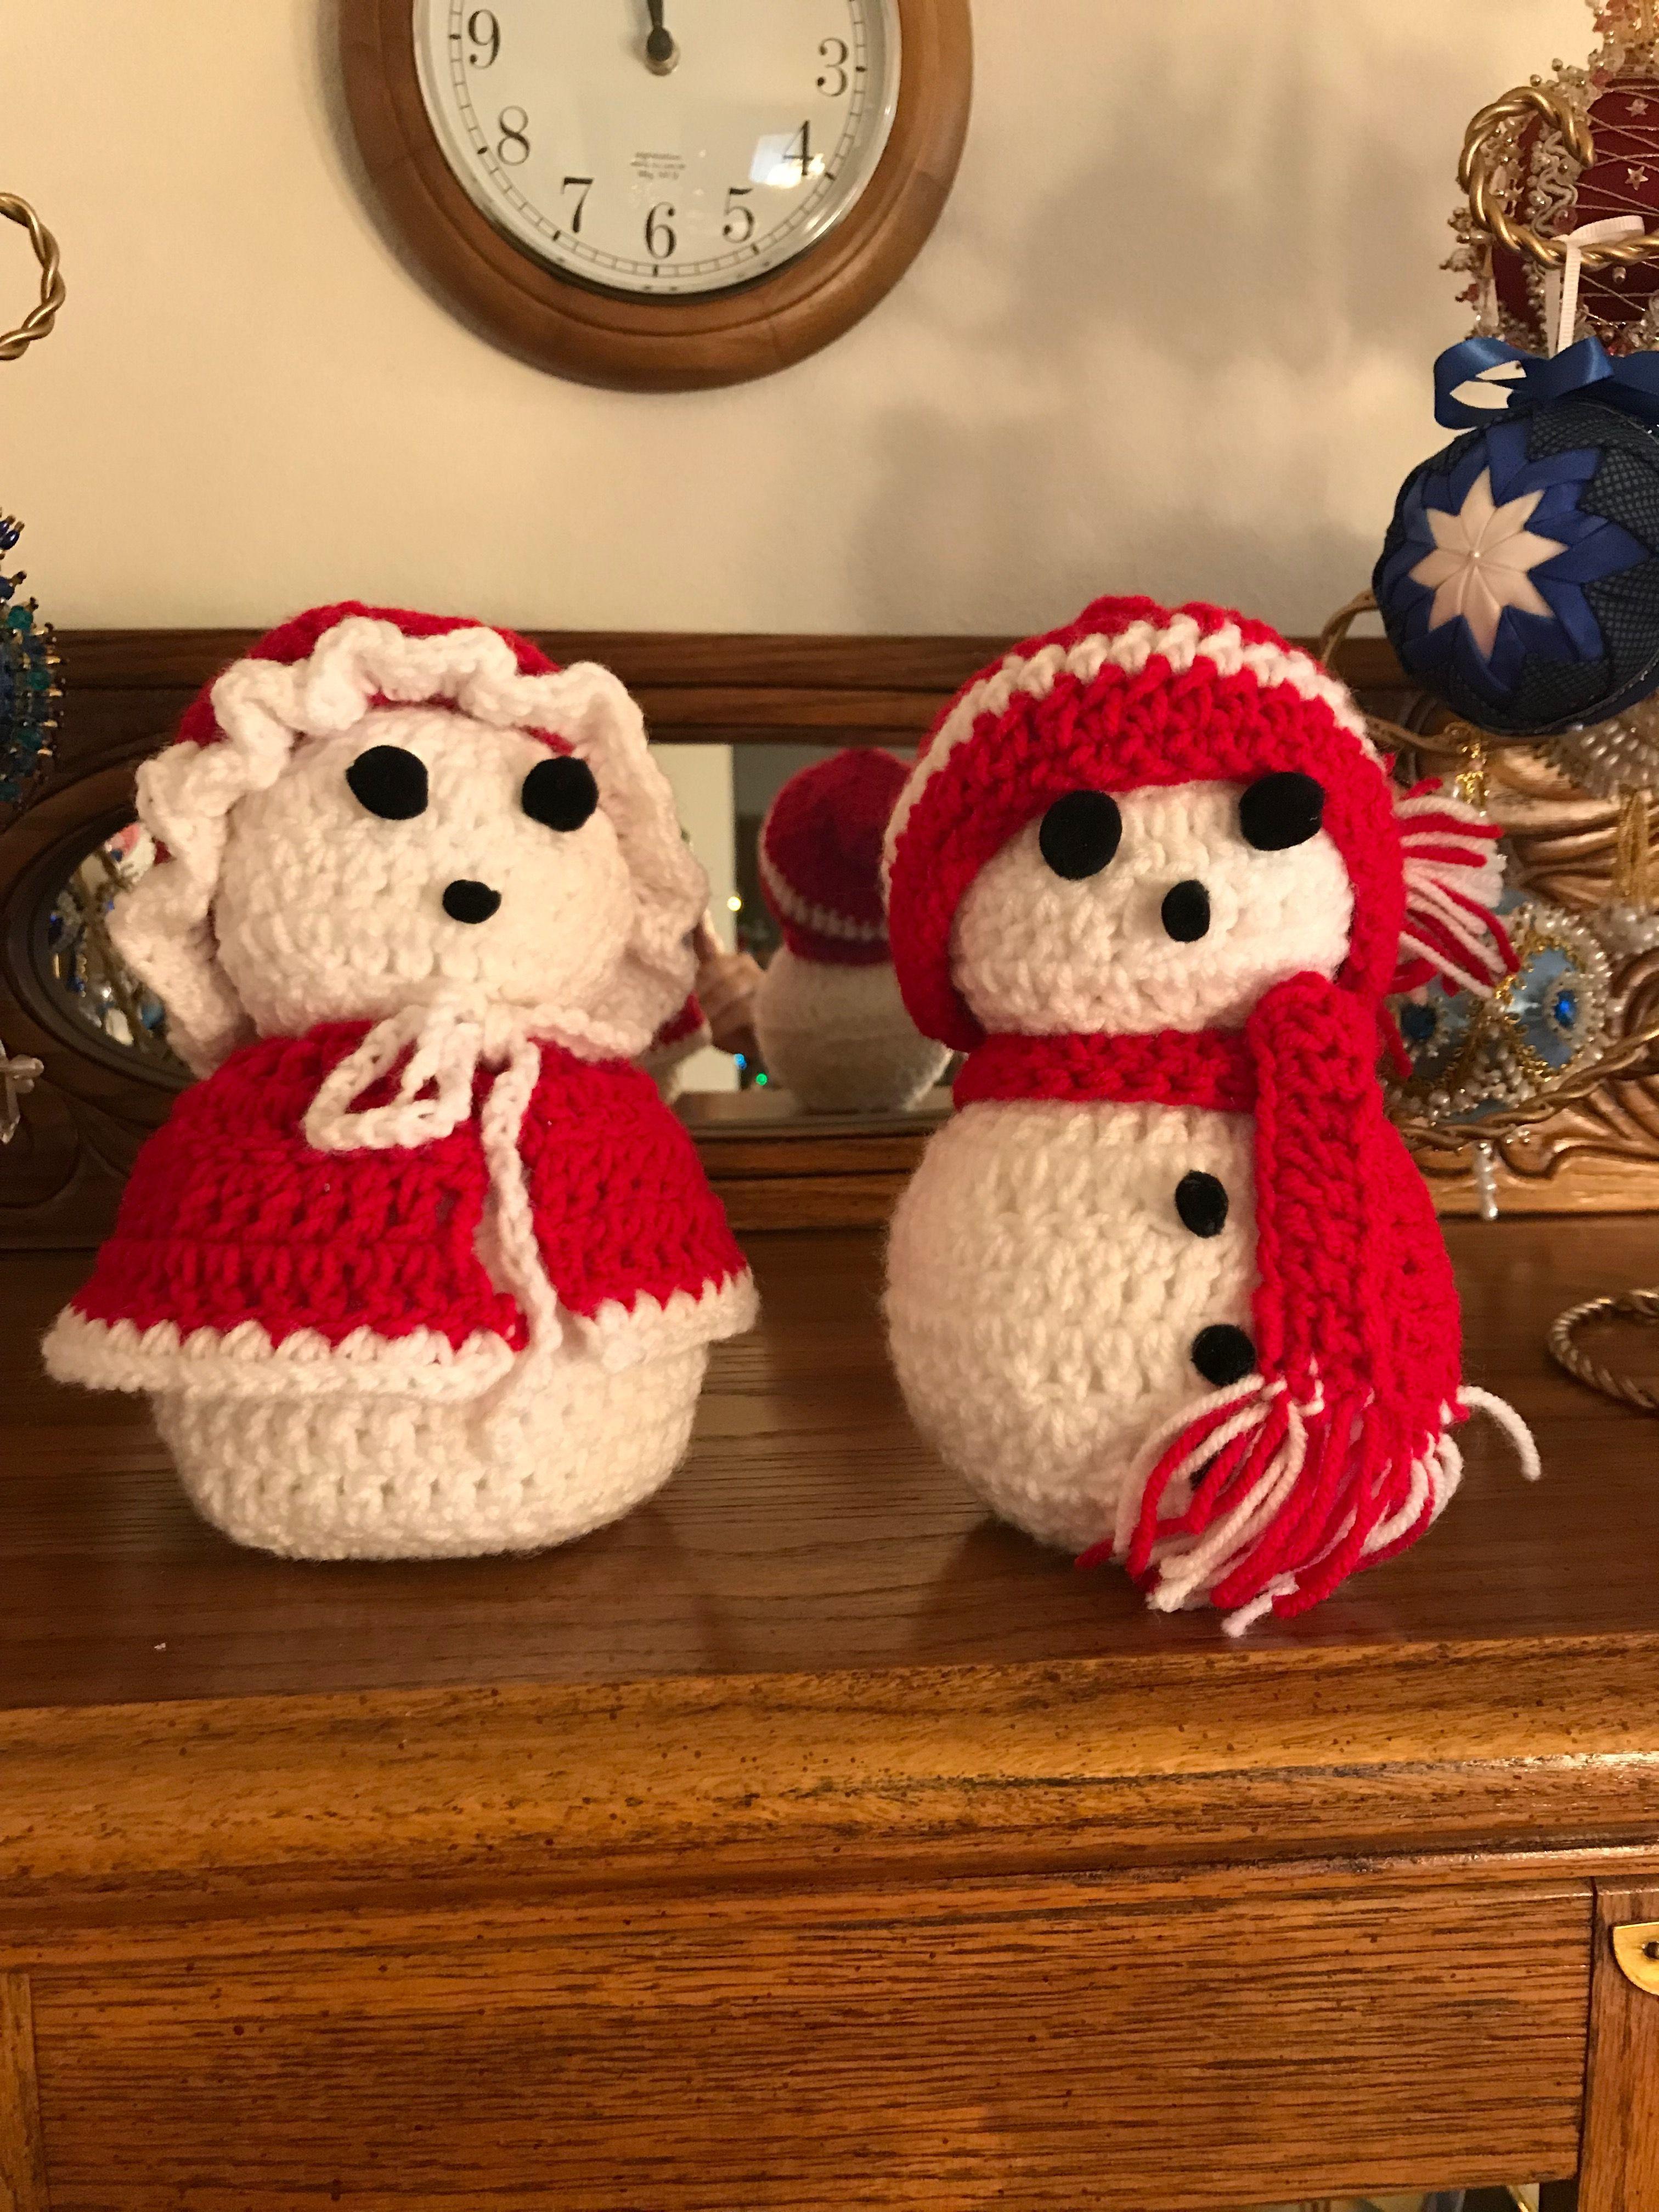 Crochet snowman set. Used foam ball for filling. Crochet